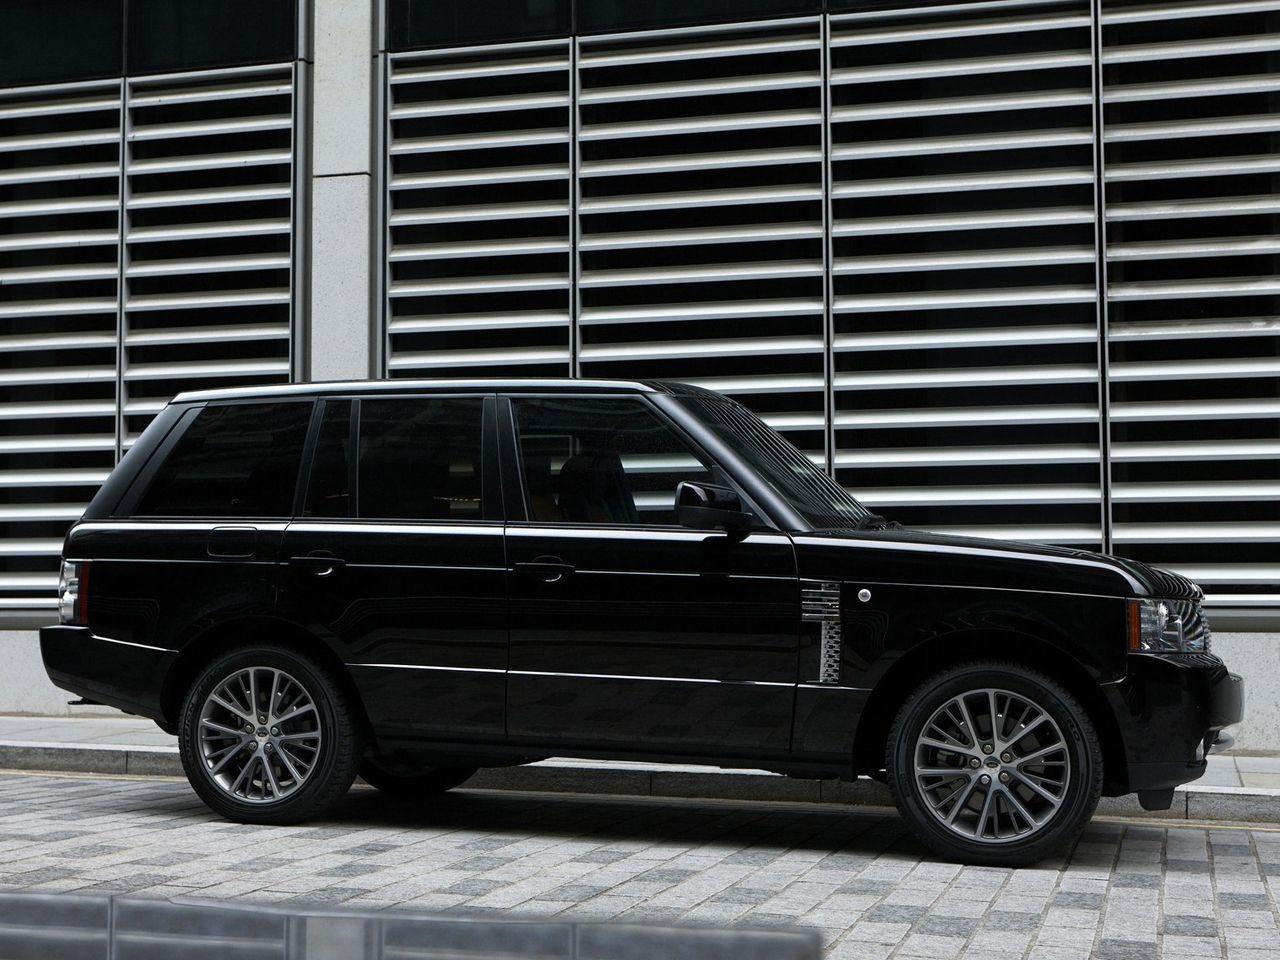 Range Rover, blacked out. Range rover, Land rover, Range